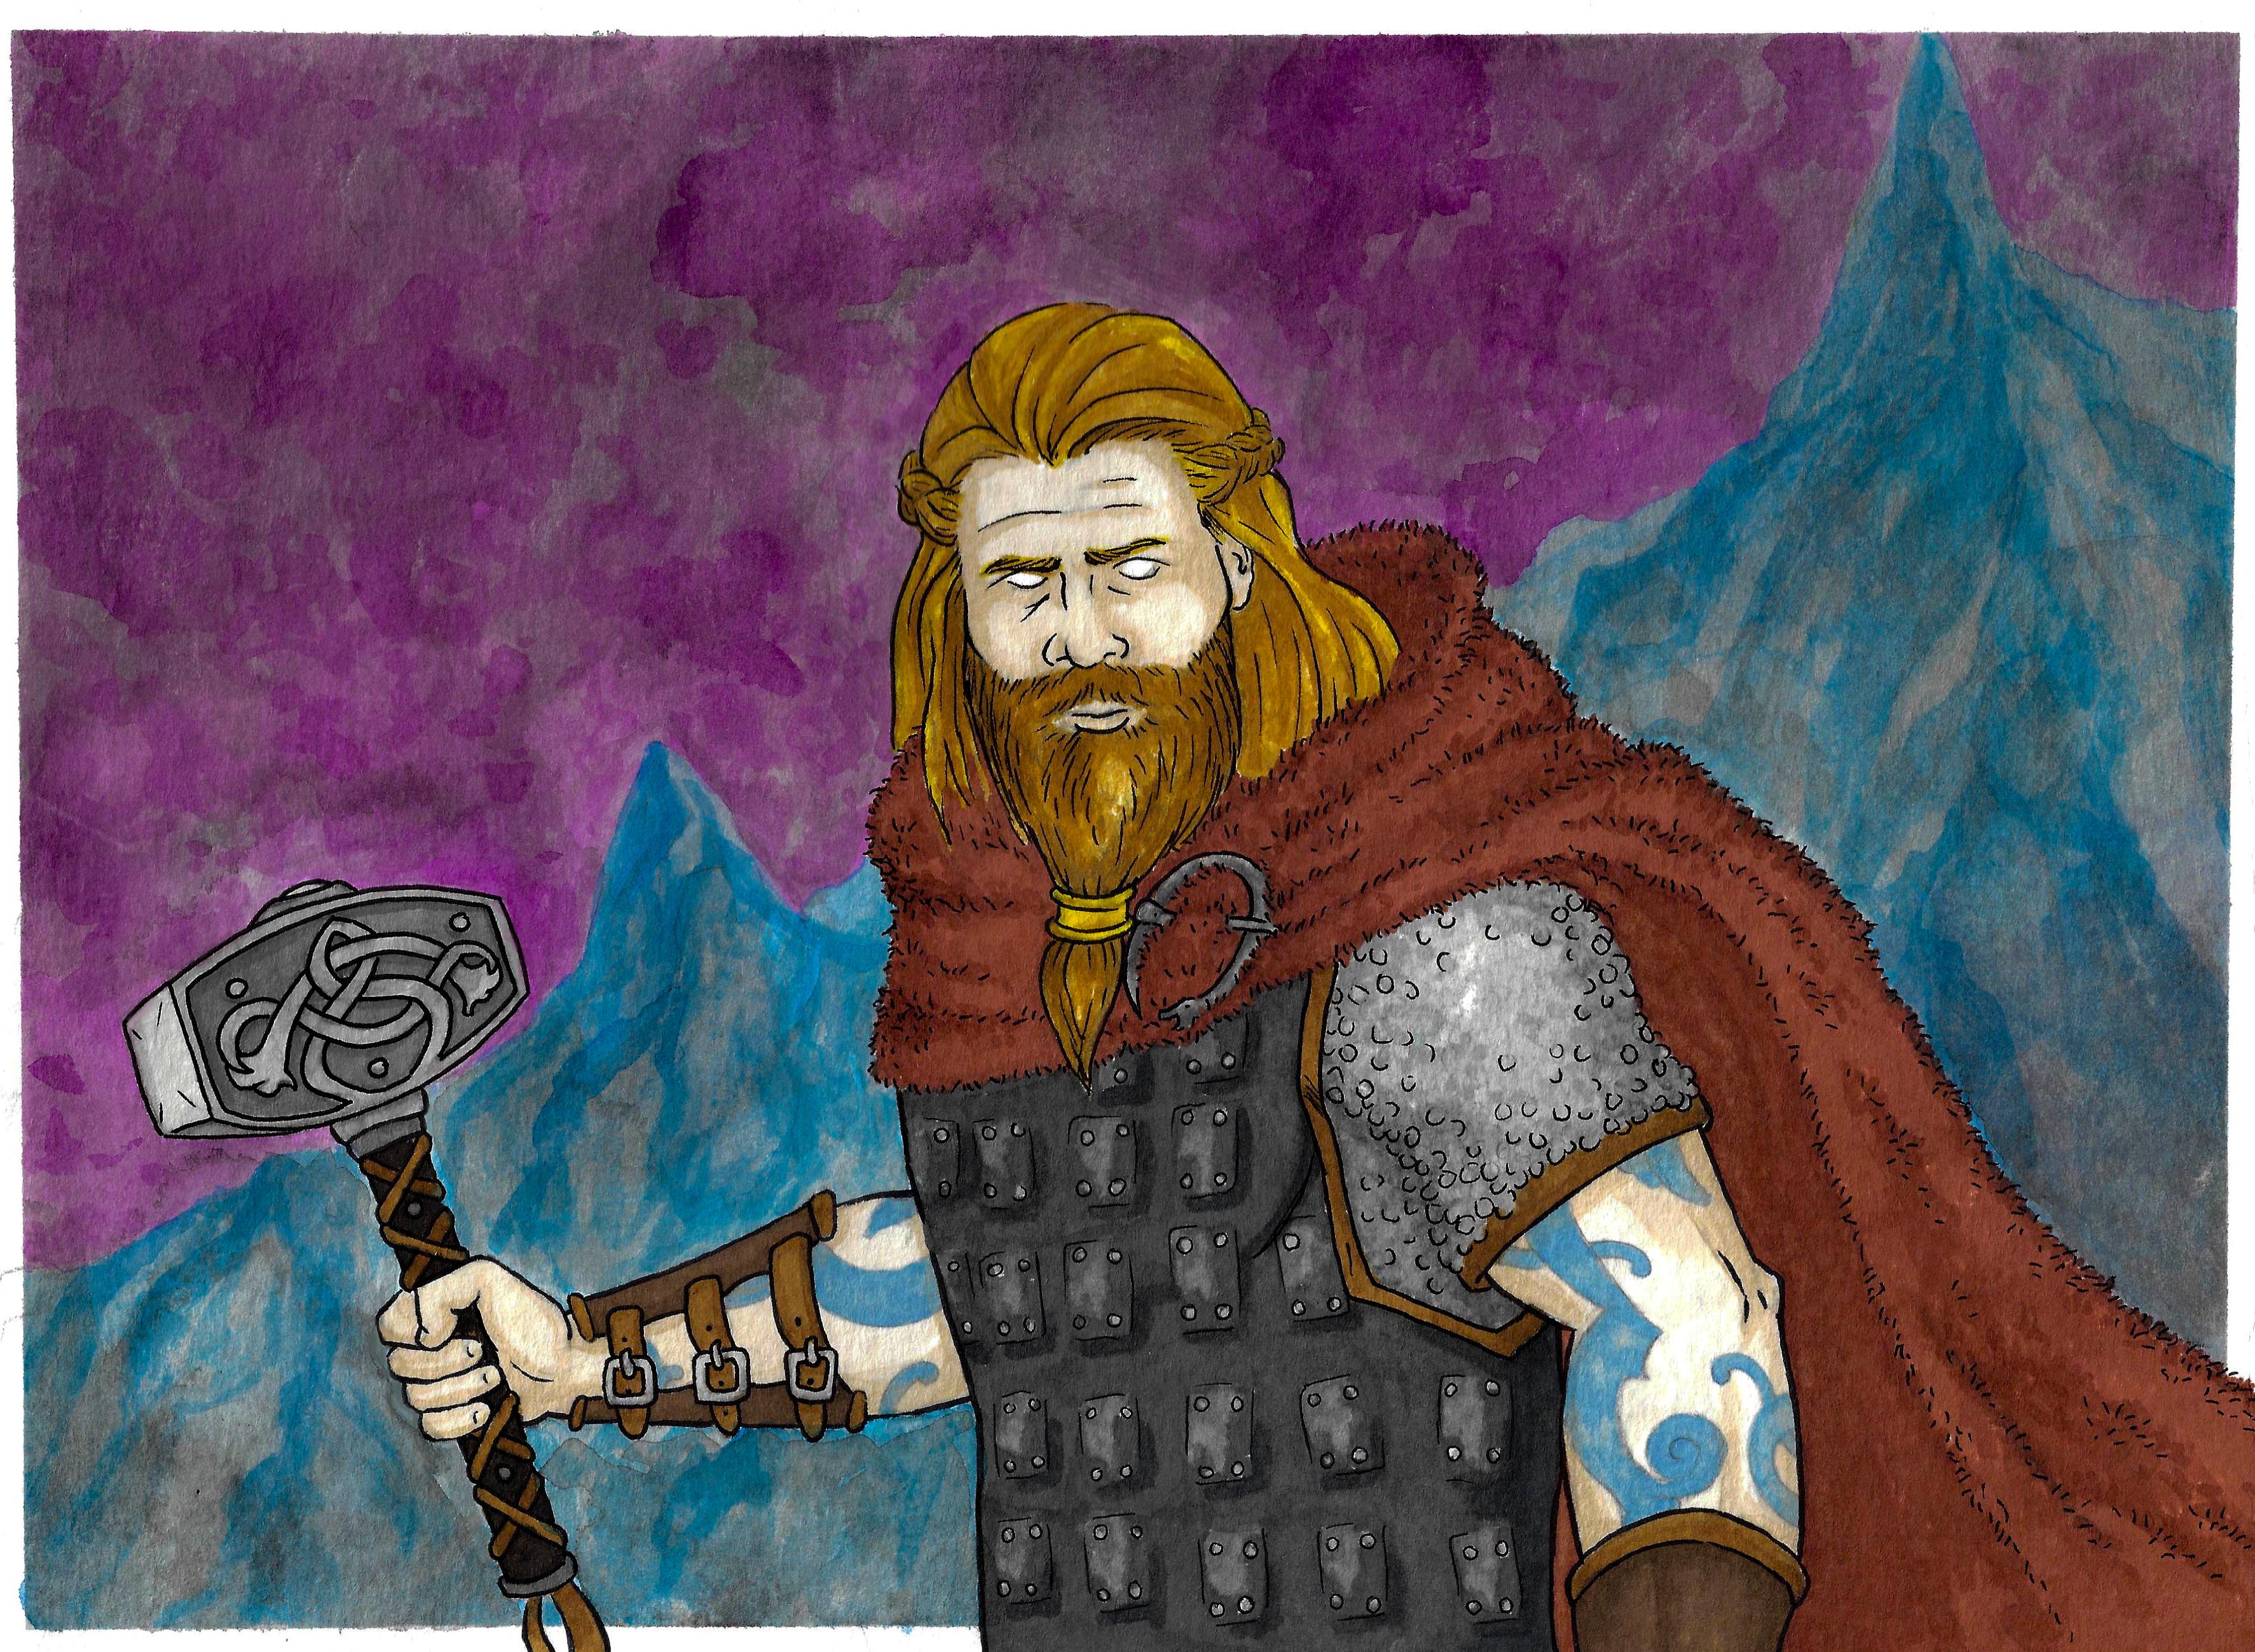 Thor, fan art. Original costume design